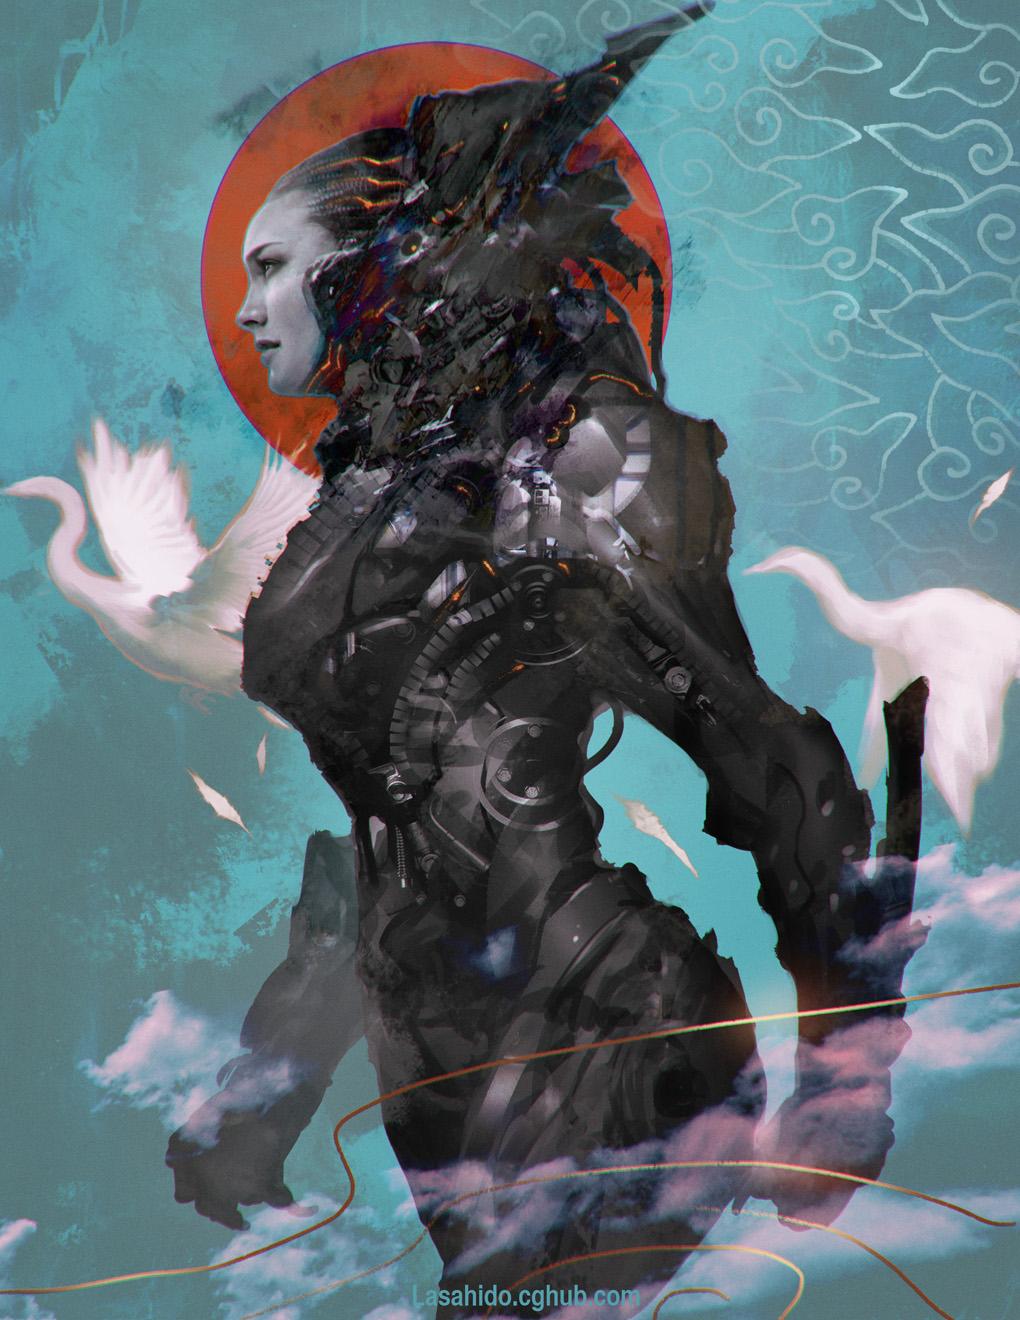 Цифровое фэнтези by Lius Lasahido